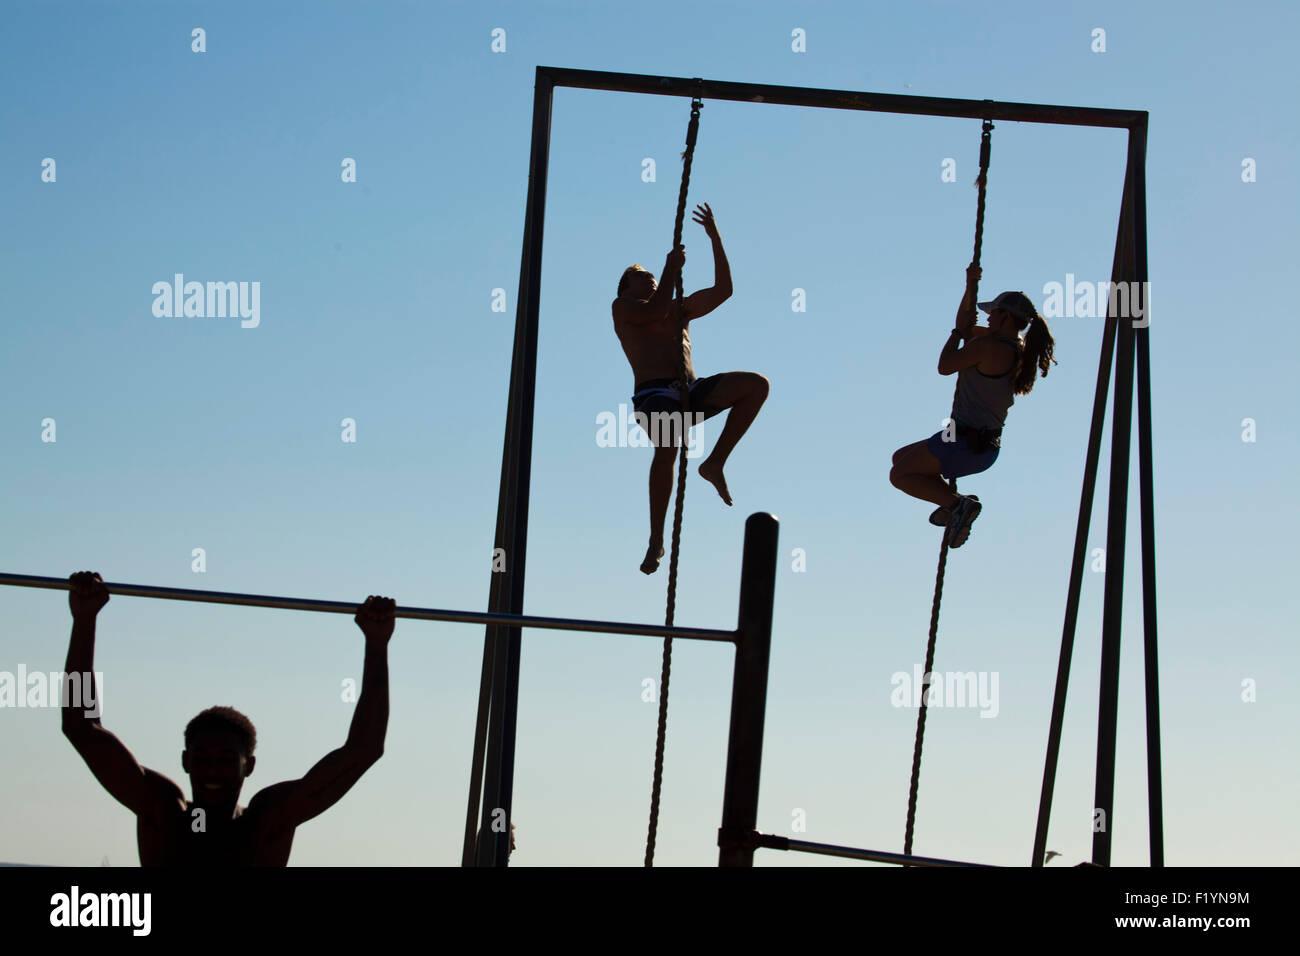 La gymnastique à la plage, Muscle Beach, Venice Beach, California, USA Photo Stock